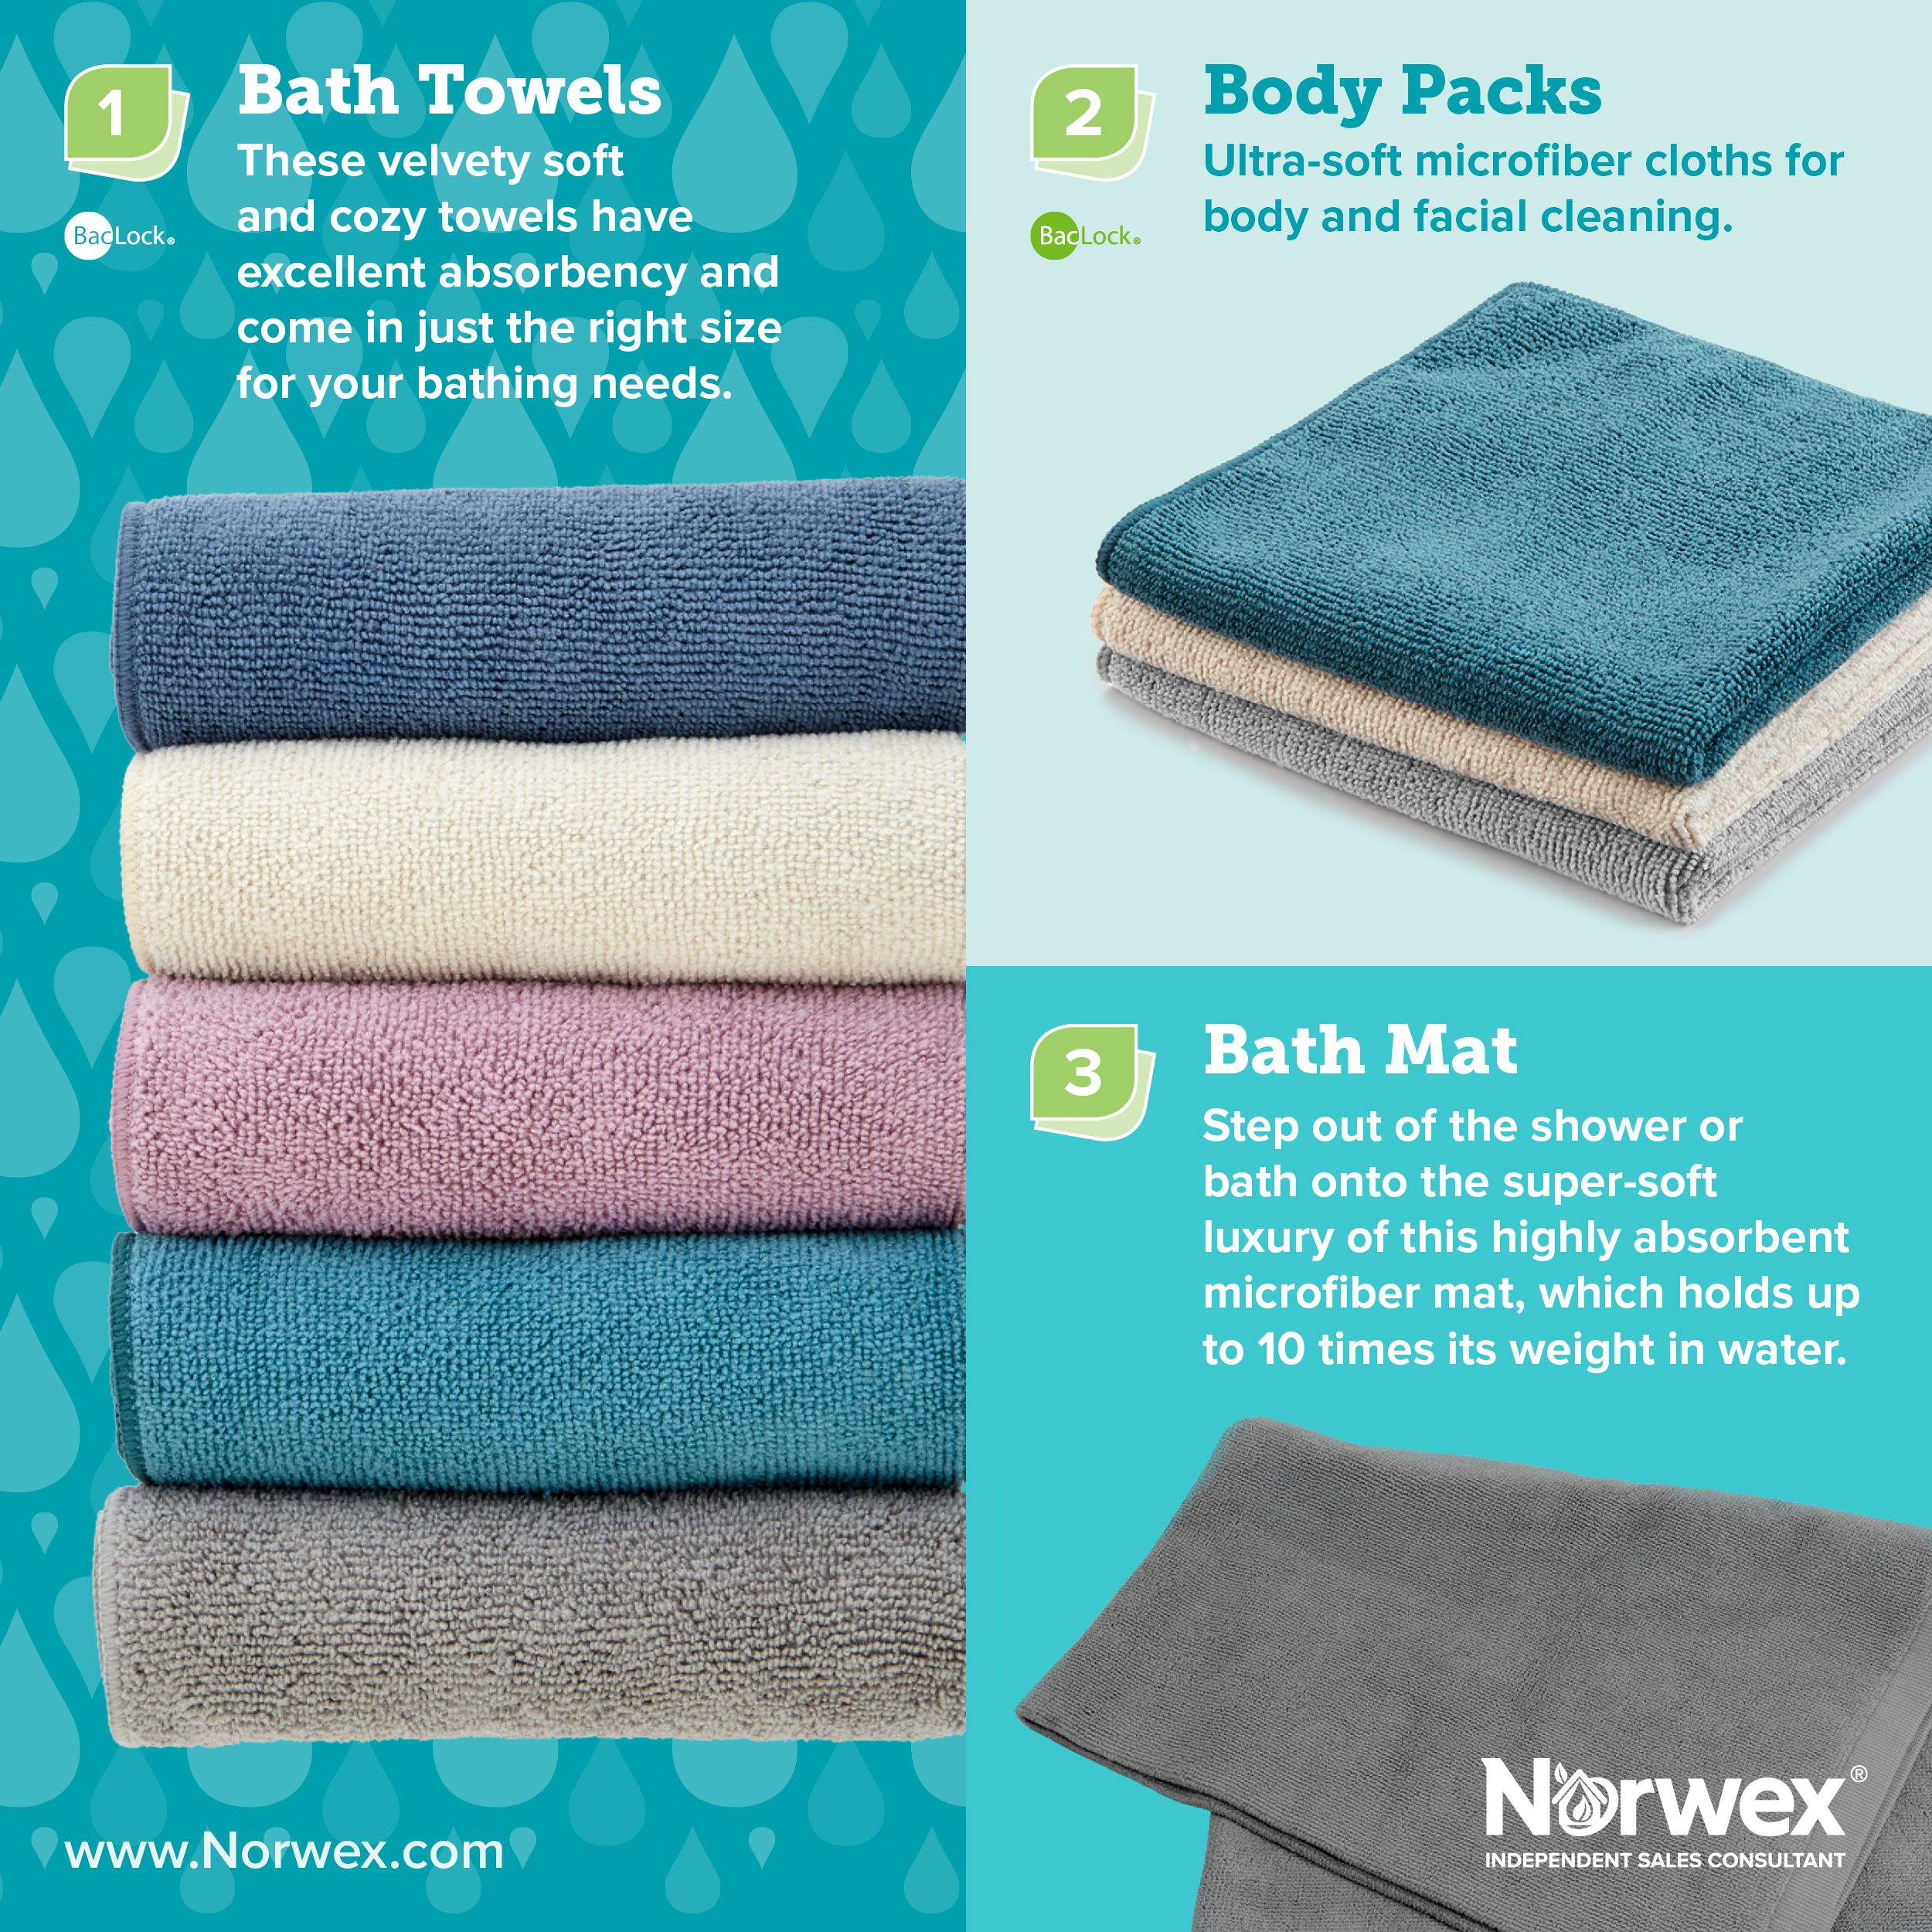 Bath towels Norwex, Norwex